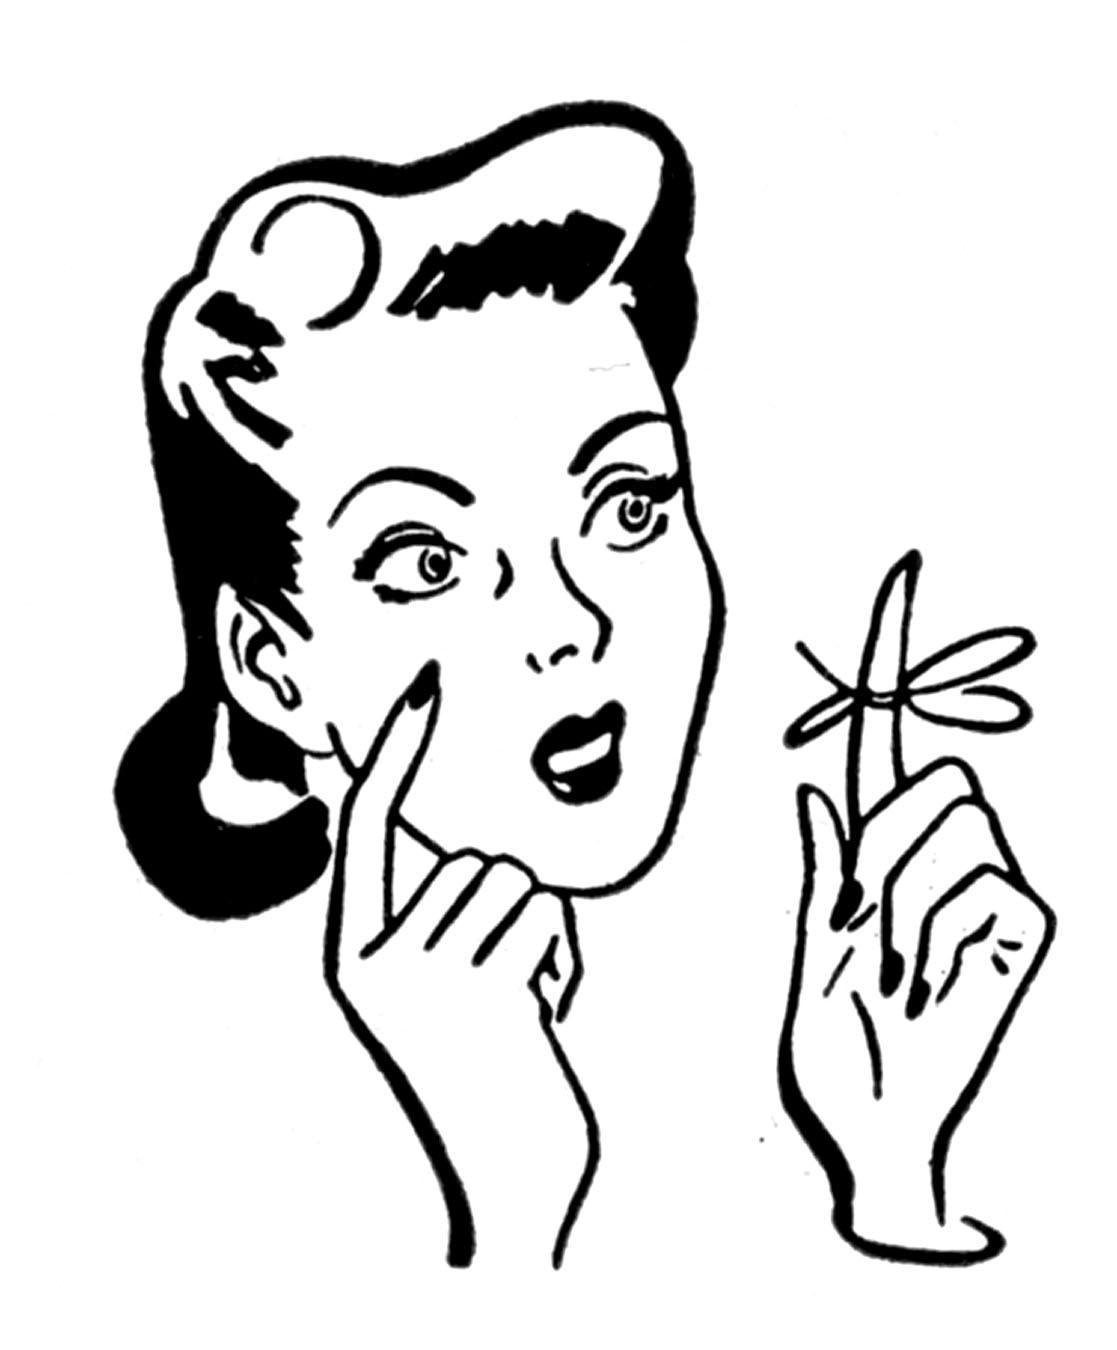 1117x1350 Friendly Reminder Clip Art Reminder Image Clipart Best Whg6xz Clipart